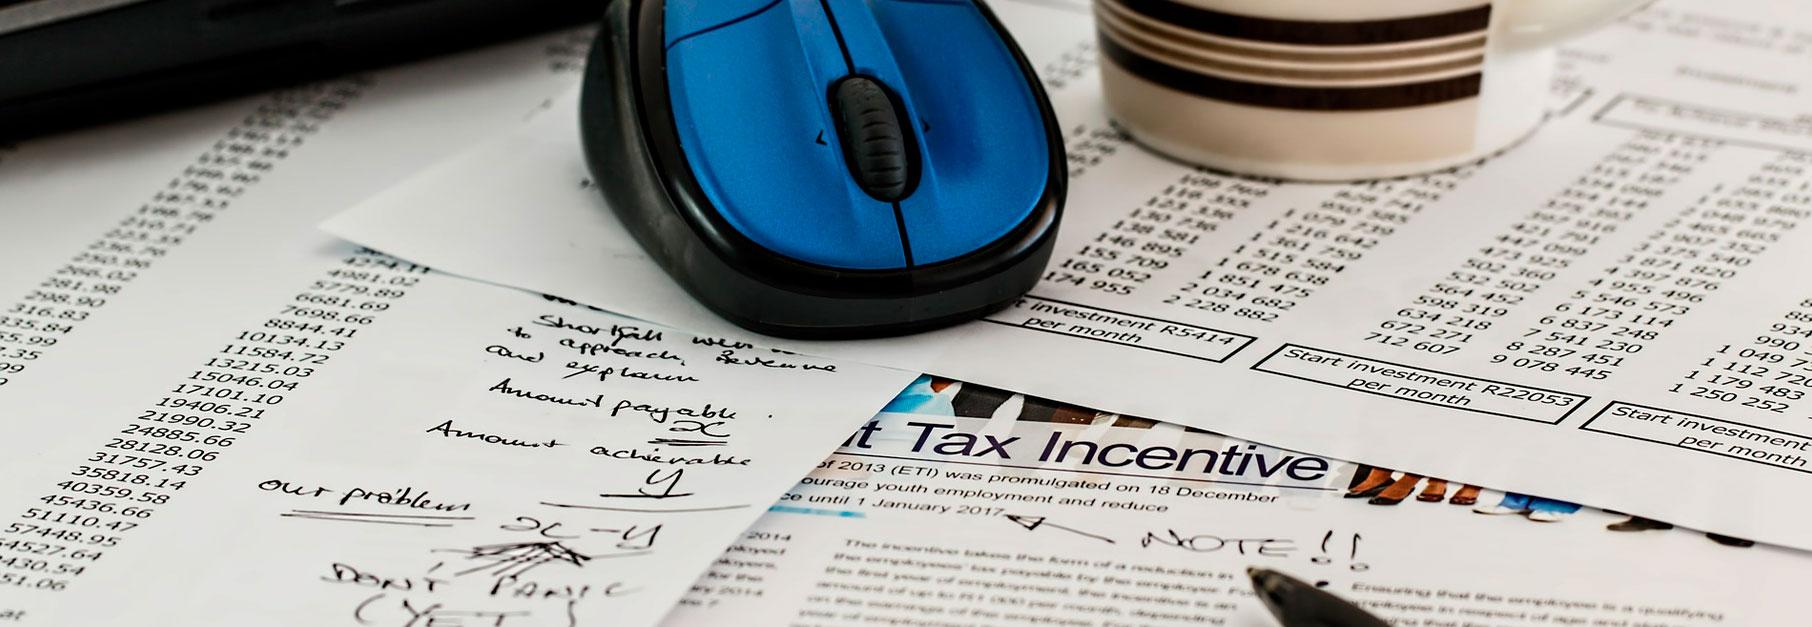 Tax Newsletter August 2019